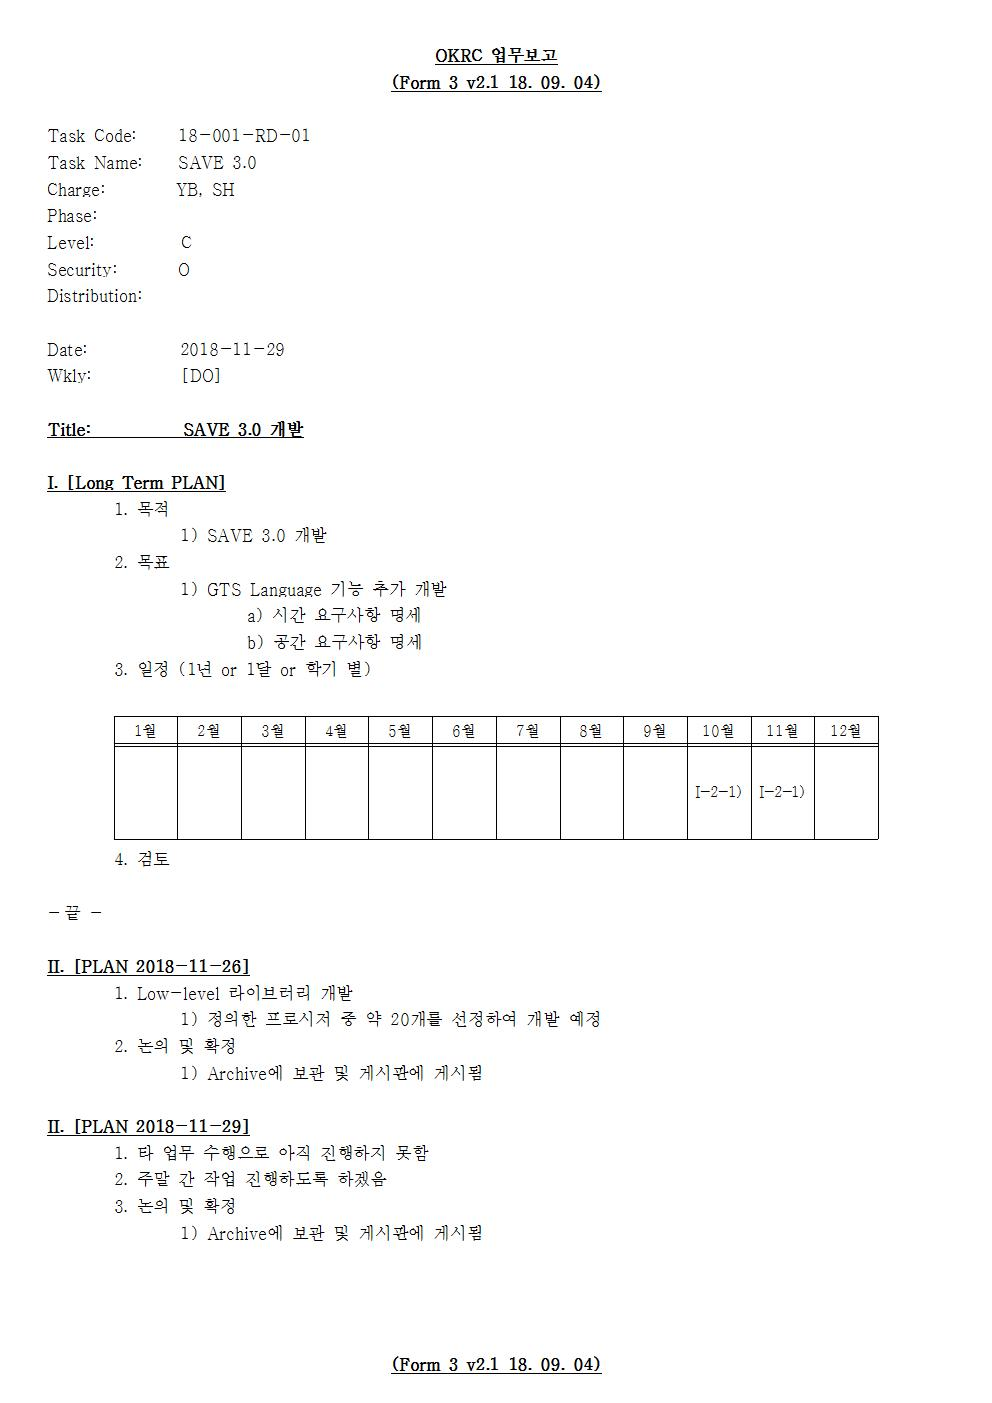 D-[18-001-RD-01]-[SAVE 3.0]-[2018-11-29][SH]001.jpg